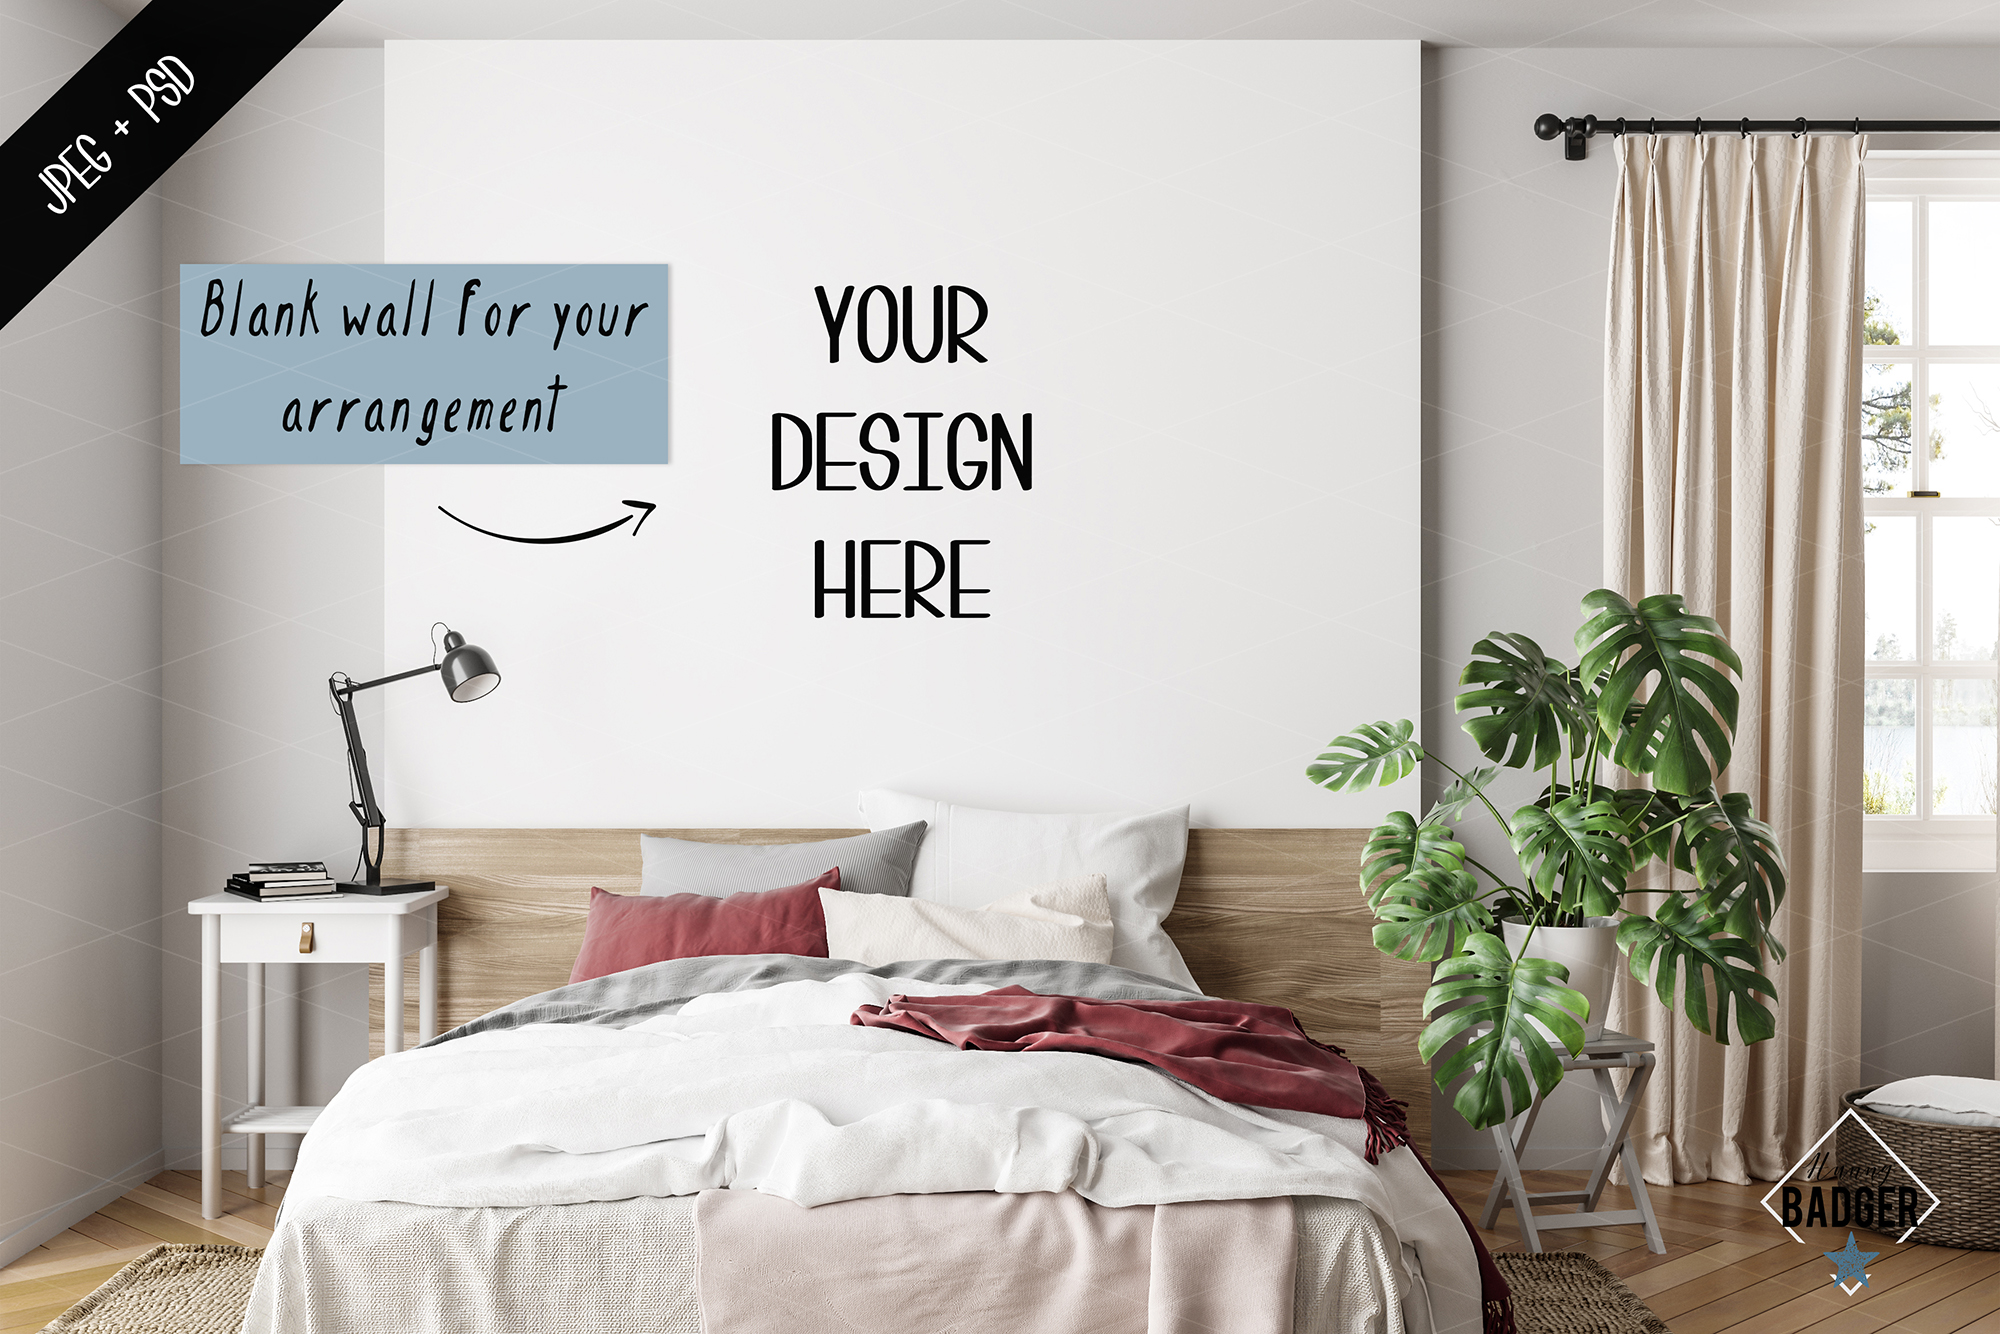 Interior mockup BUNDLE - frame & wall mockup creator example image 5